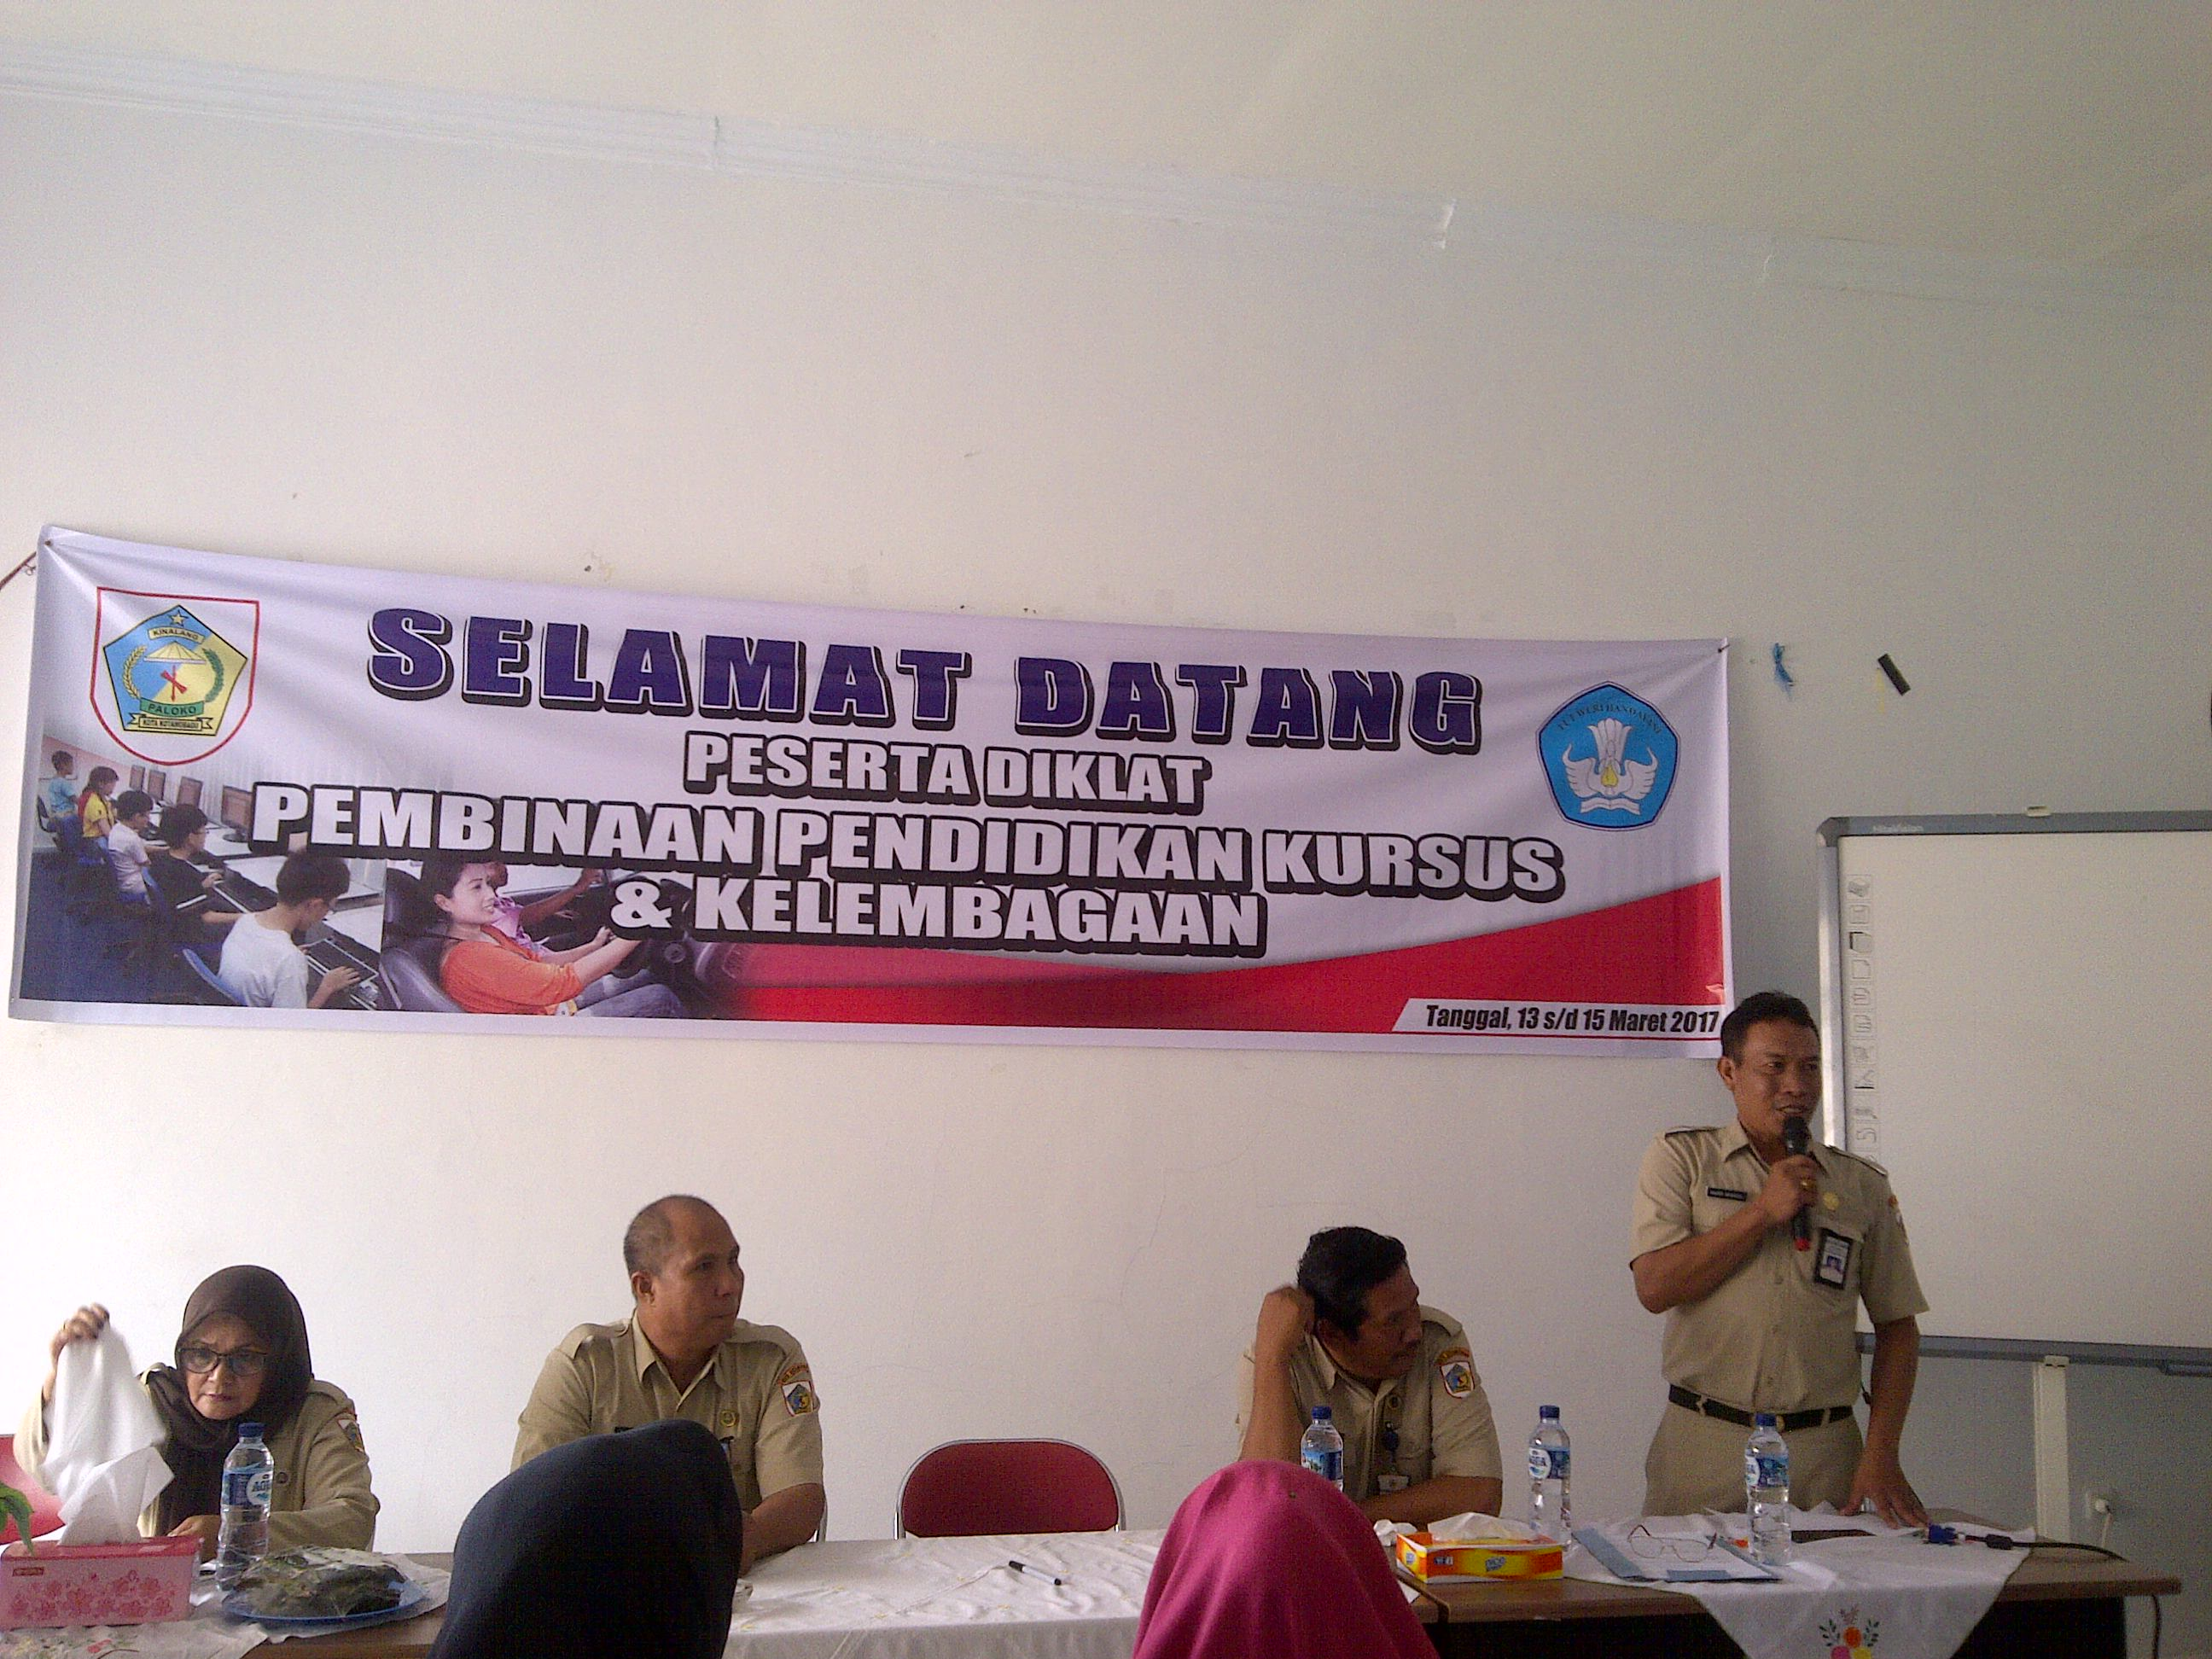 Pemkot GelarDiklat Pembinaan Pendidikan Kursus dan Kelembagaan